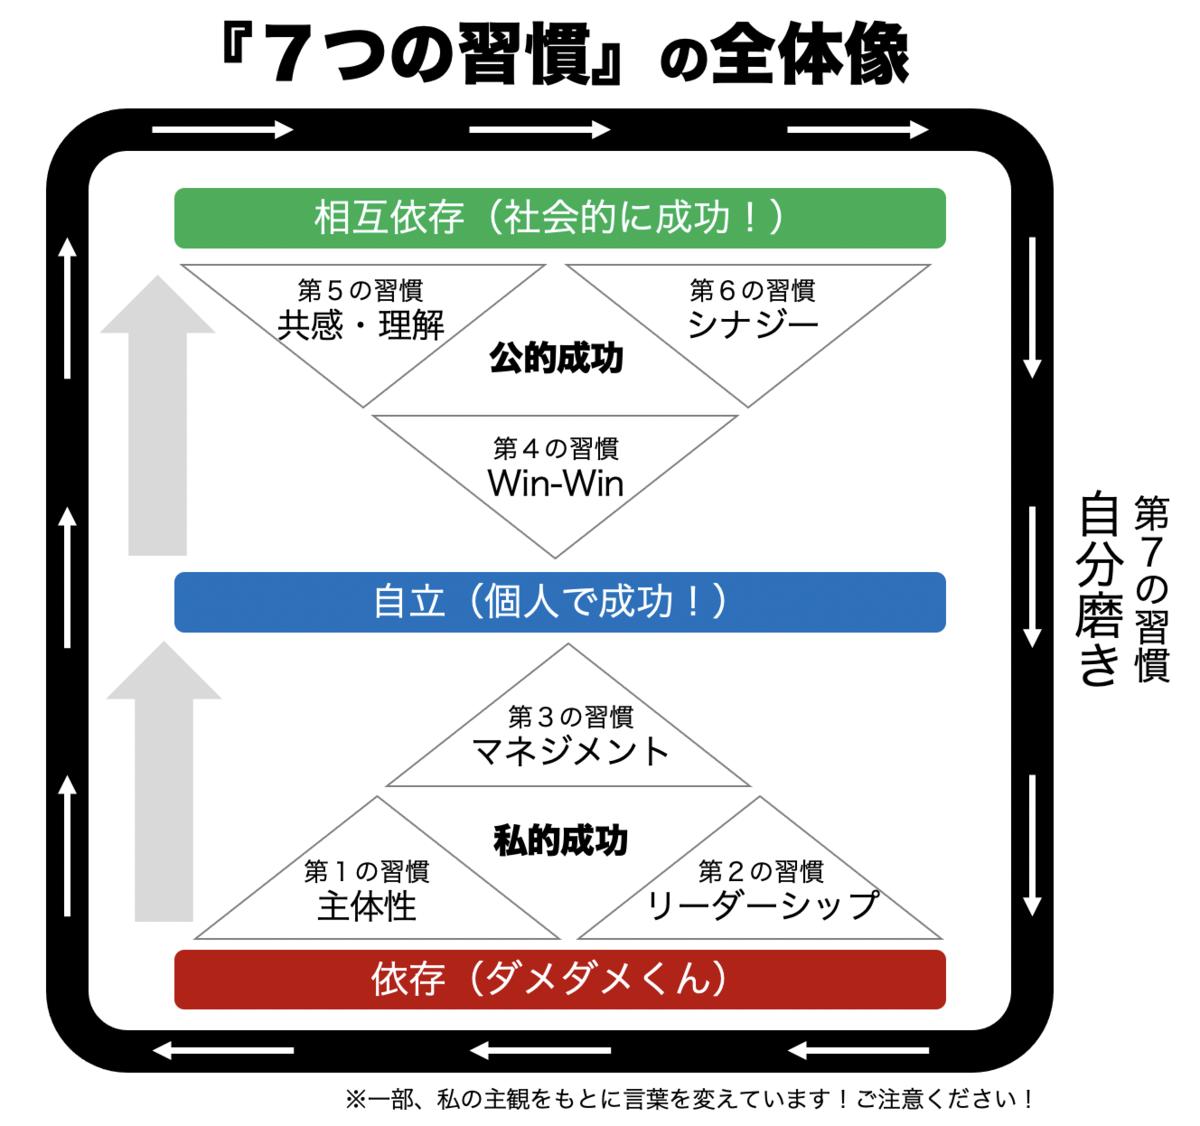 f:id:presen-sen-nin:20201015182040p:plain